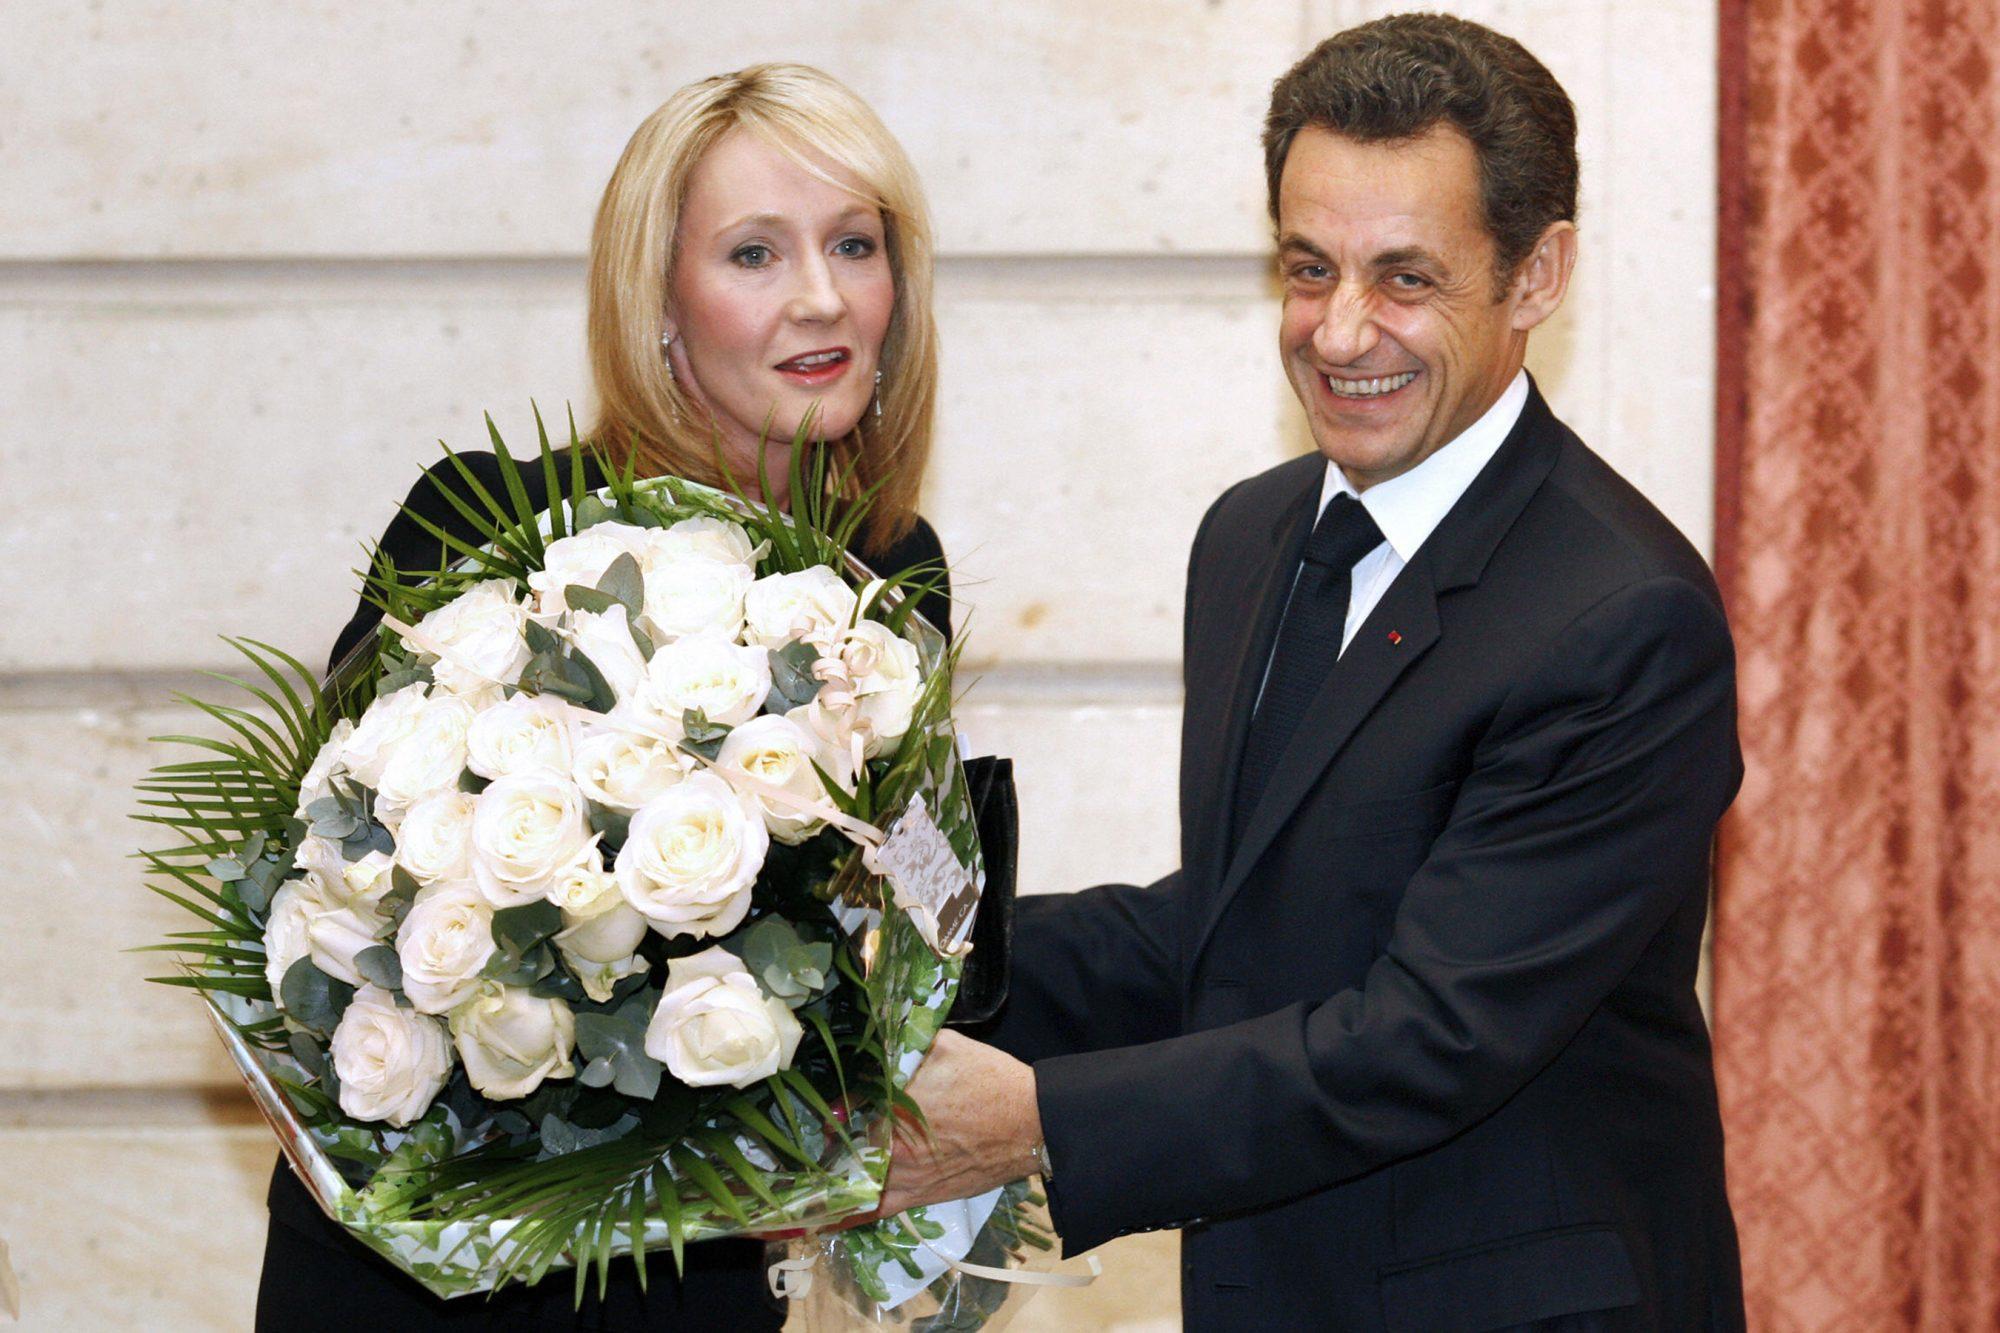 French president Nicolas Sarkozy (R) giv